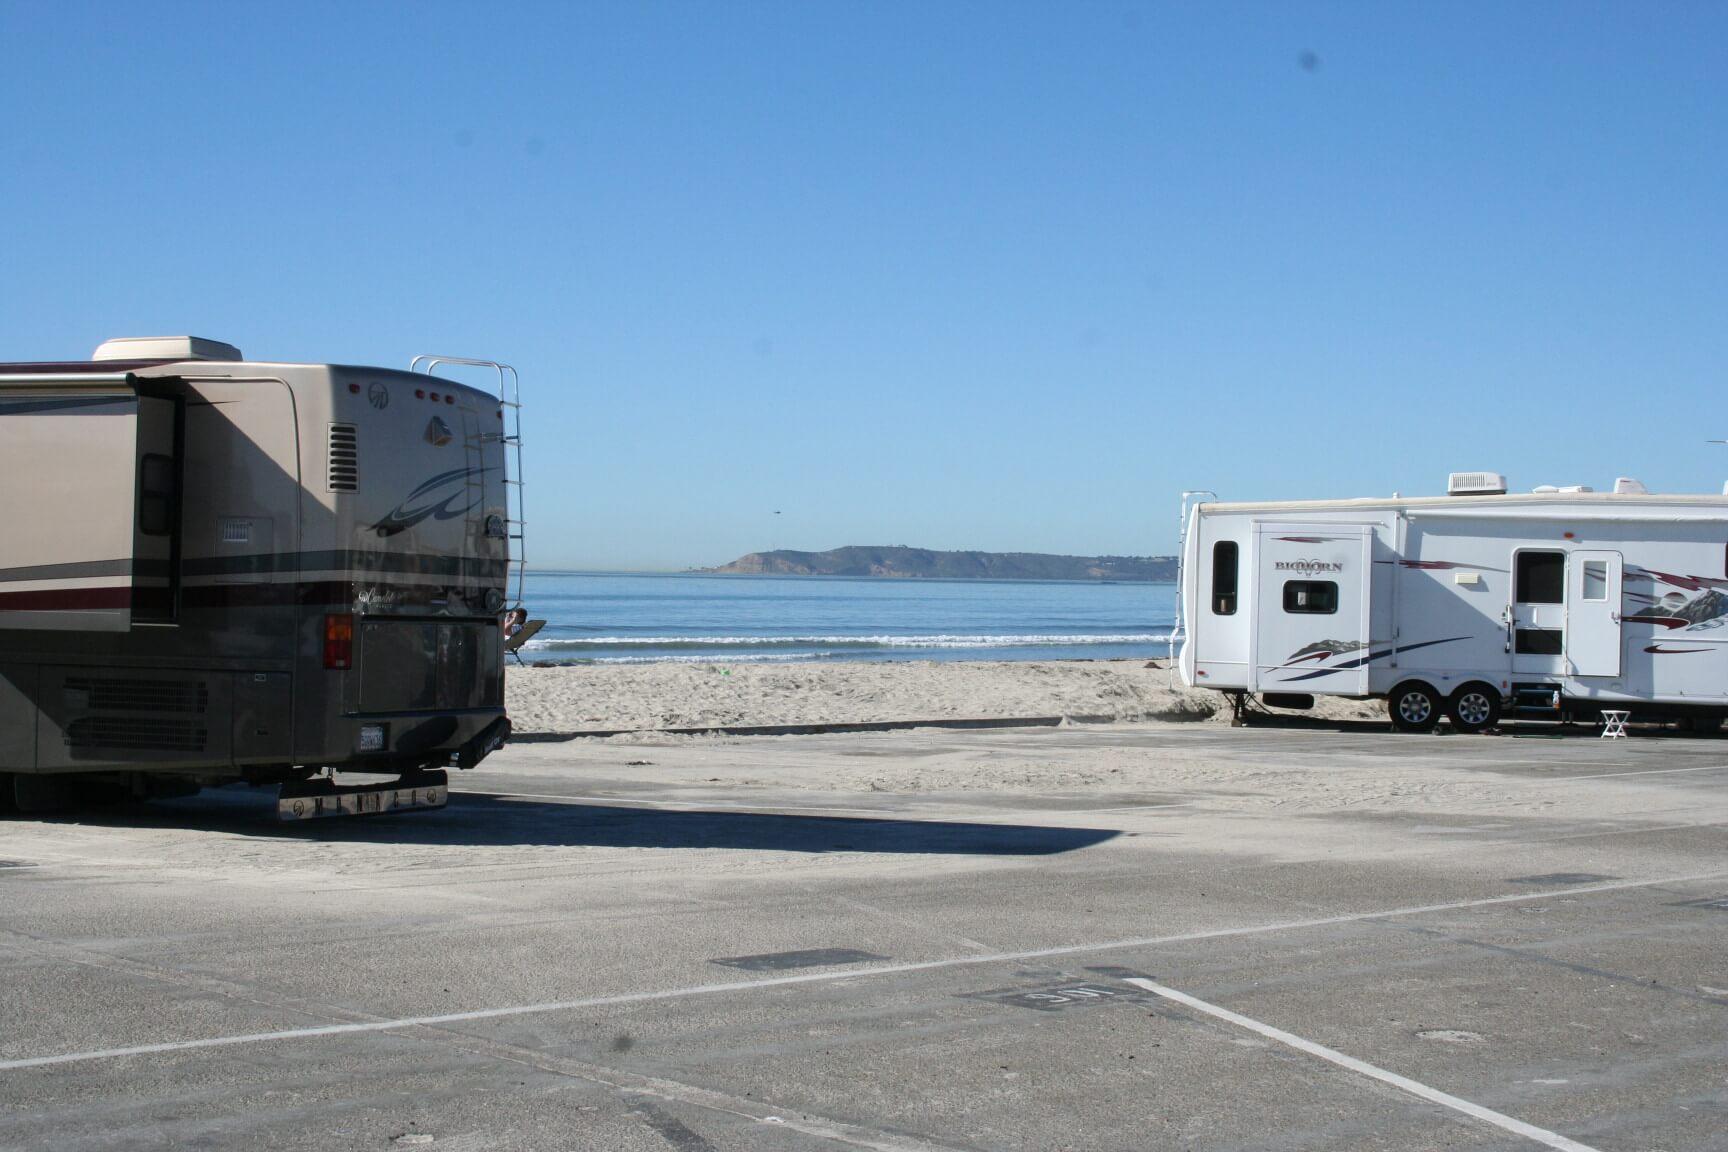 San Elijo State Beach & Silve Strand State Beach - New Photos_Beach Campsite